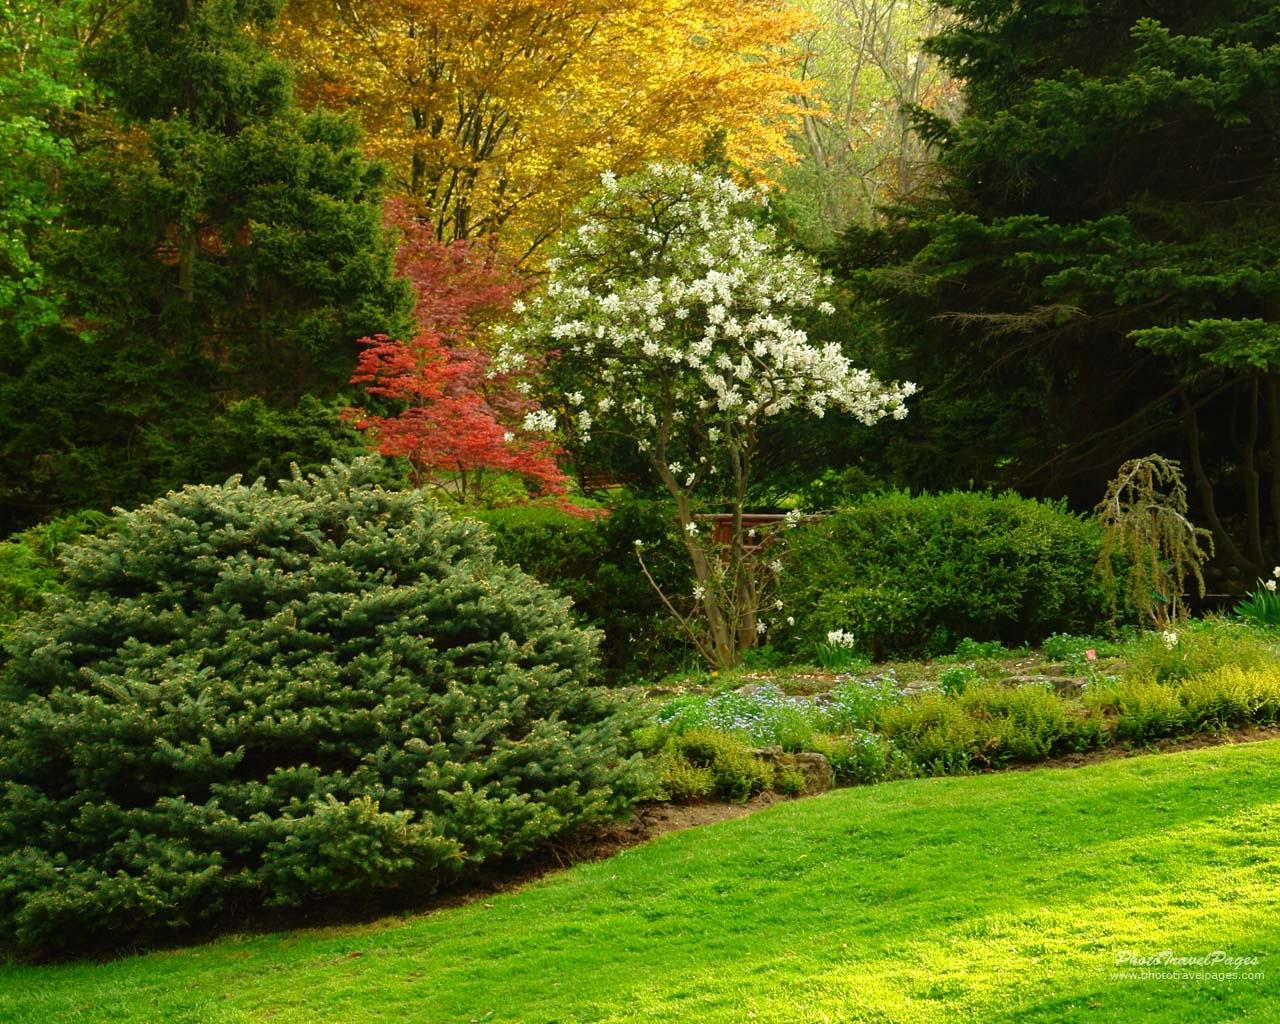 Garden Wallpapers - Full HD Wallpaper